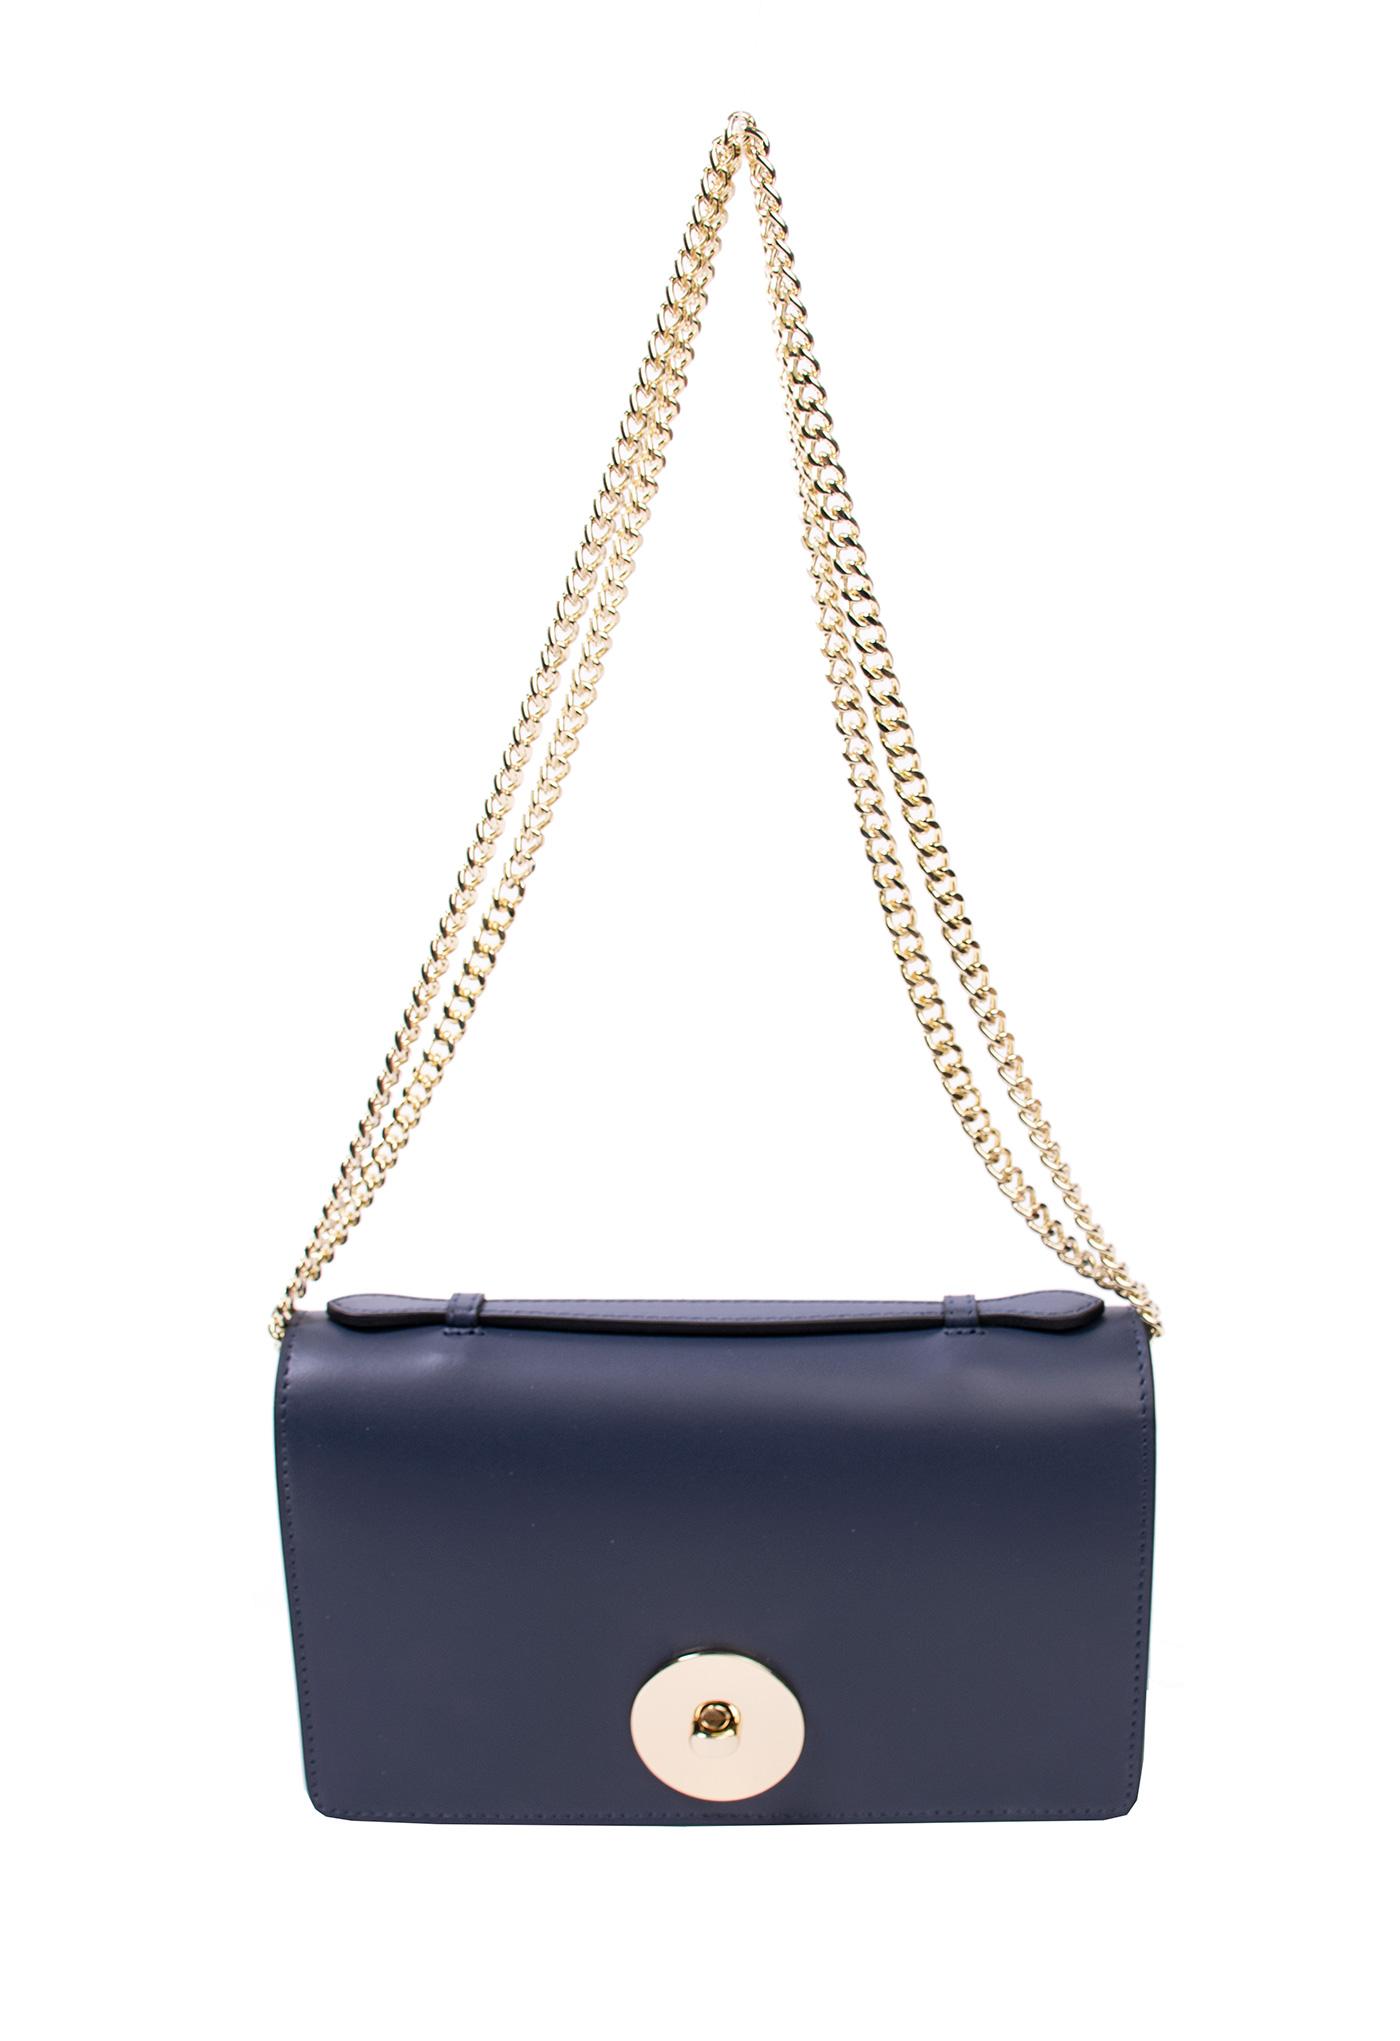 8f5875d8ef0d Bags and more Florenza Sötét kék Női Bőr Oldaltáska | bagsnmore.hu